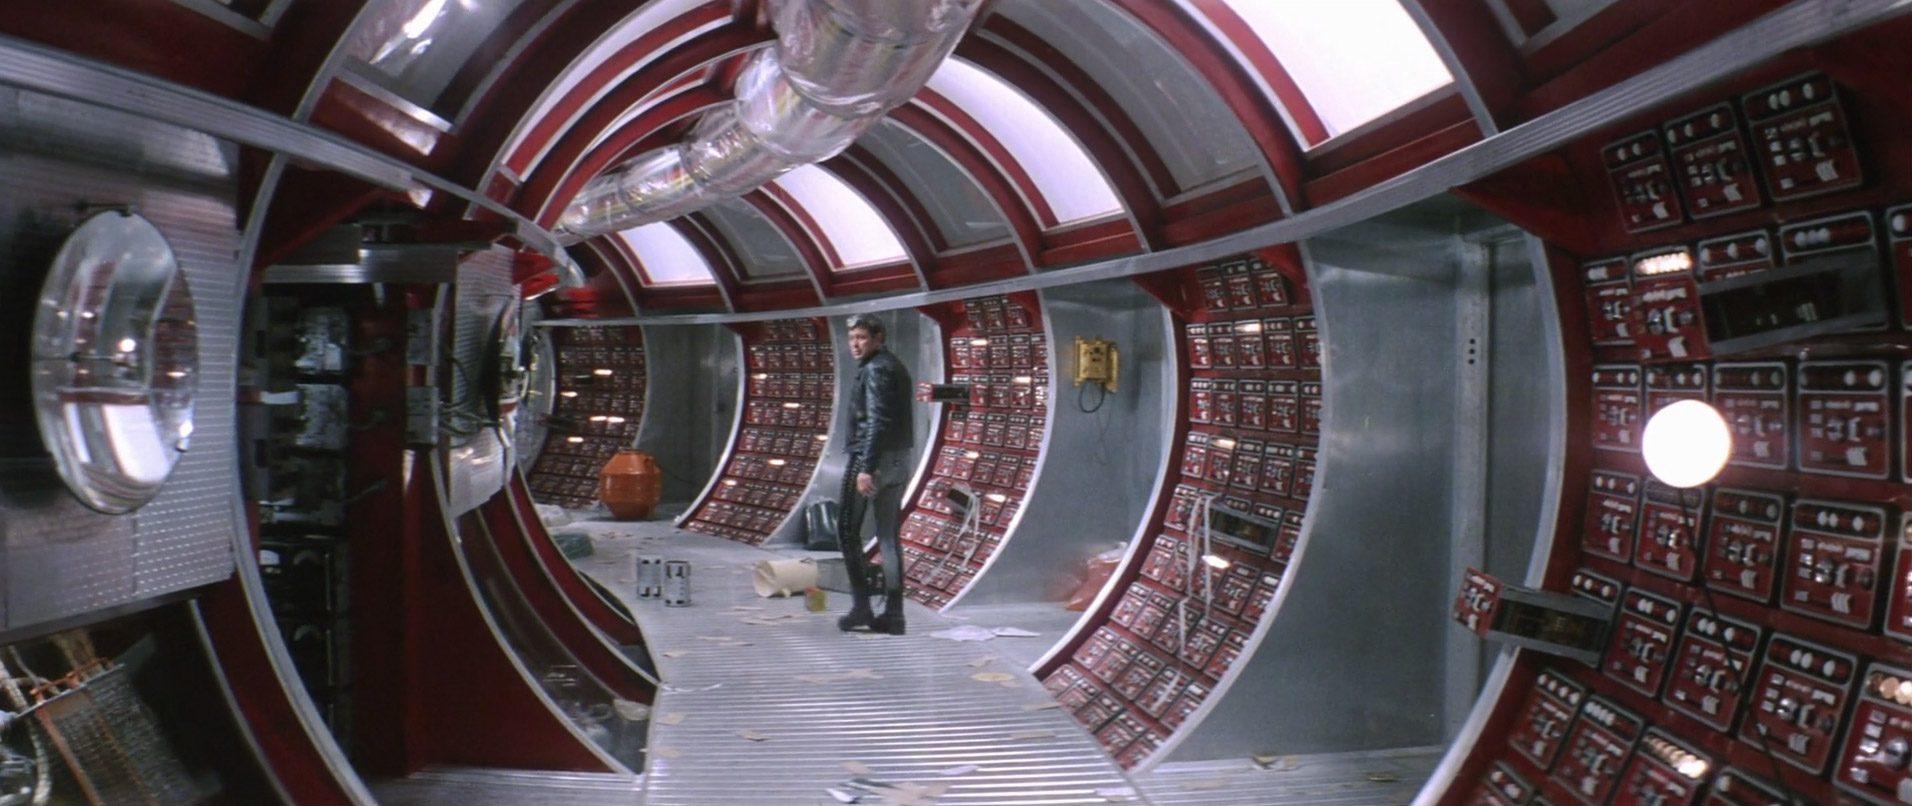 Filmszene aus Solaris (1972)